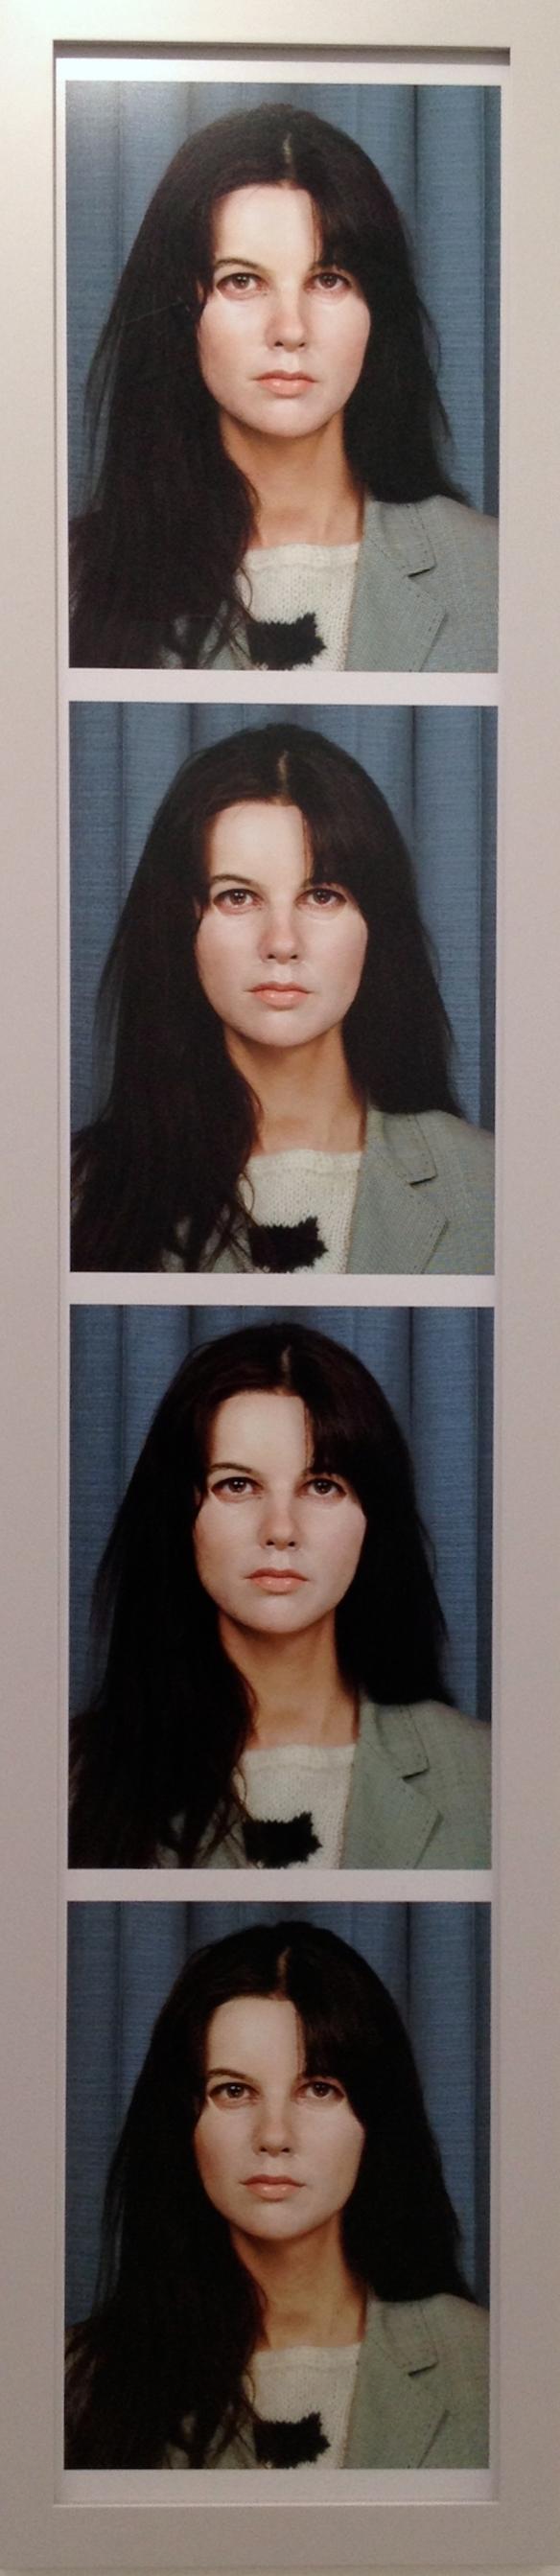 Gillian Wearing, Self Portrait at Twenty Seven Years Old, 2012